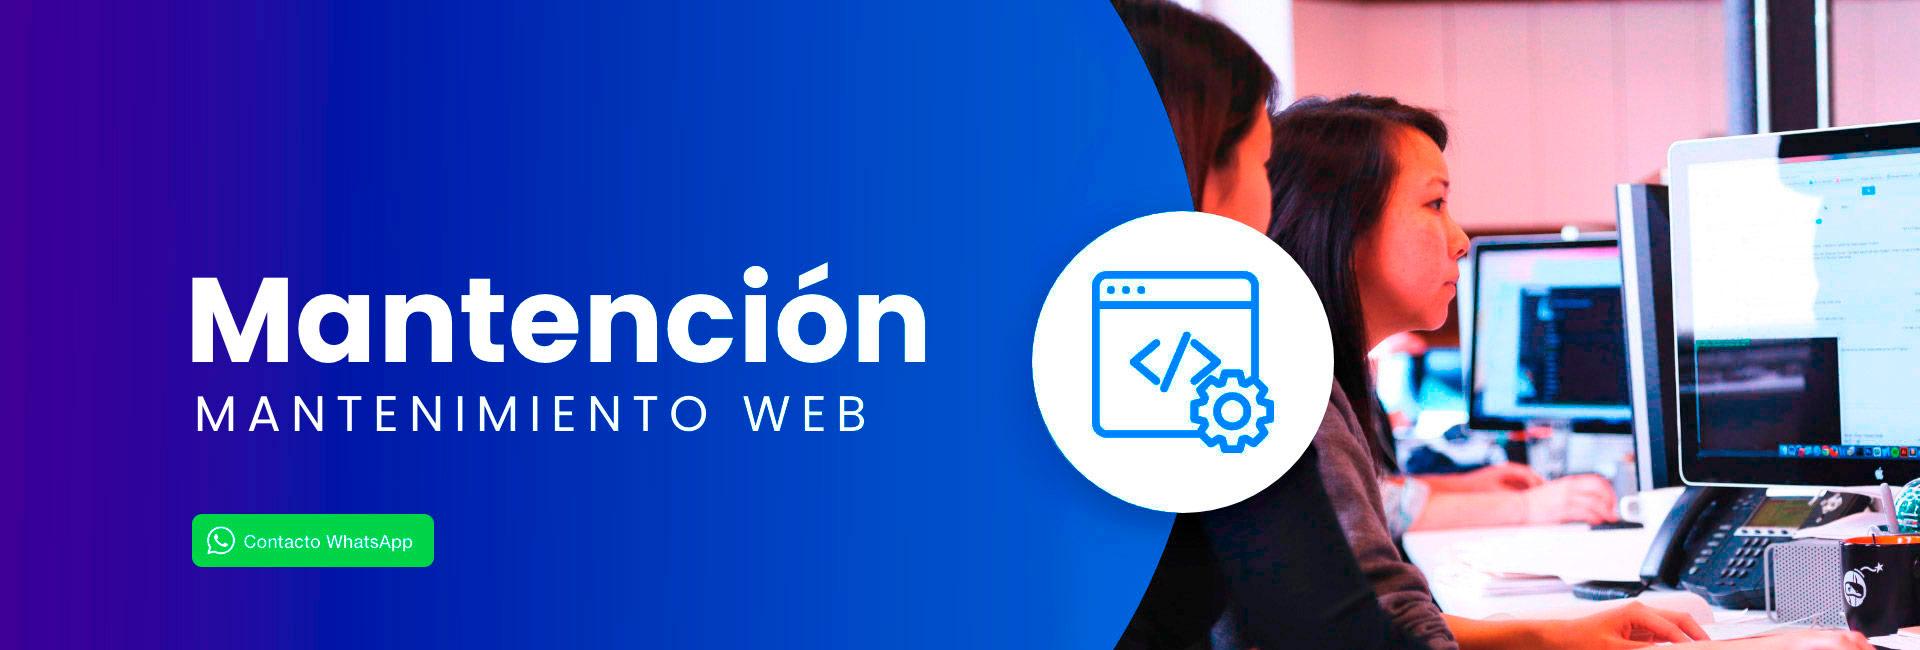 Banner Pagina WEB 1100x350px (Precampana)